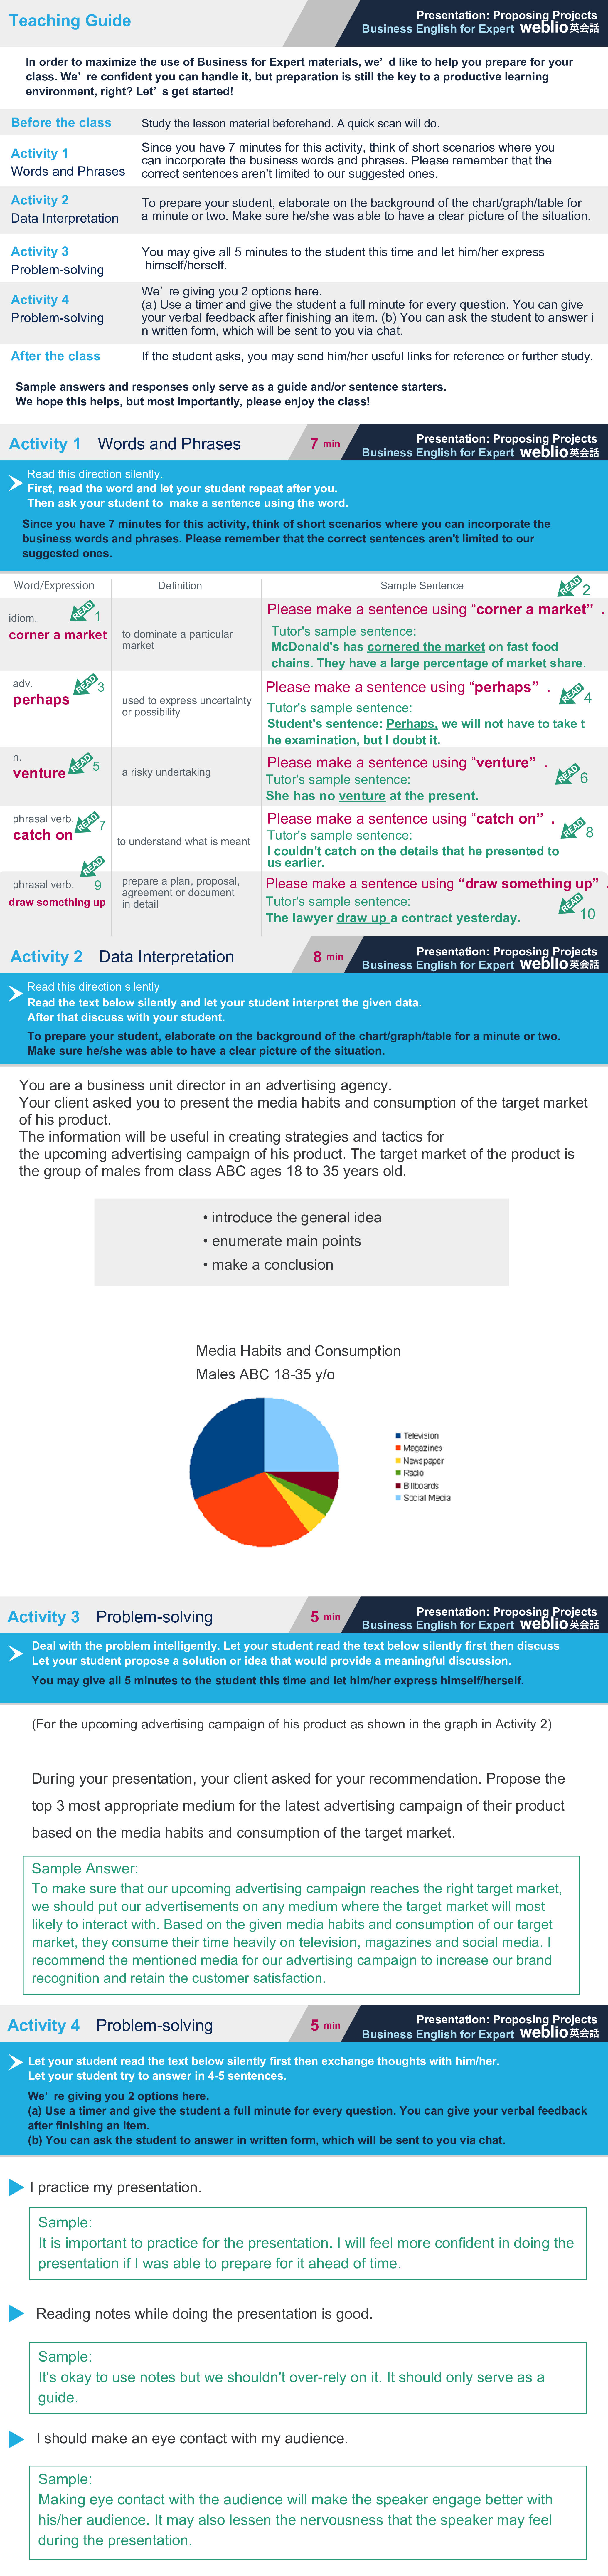 business-expert,business-presentation-proposing-projects-tutors-copy